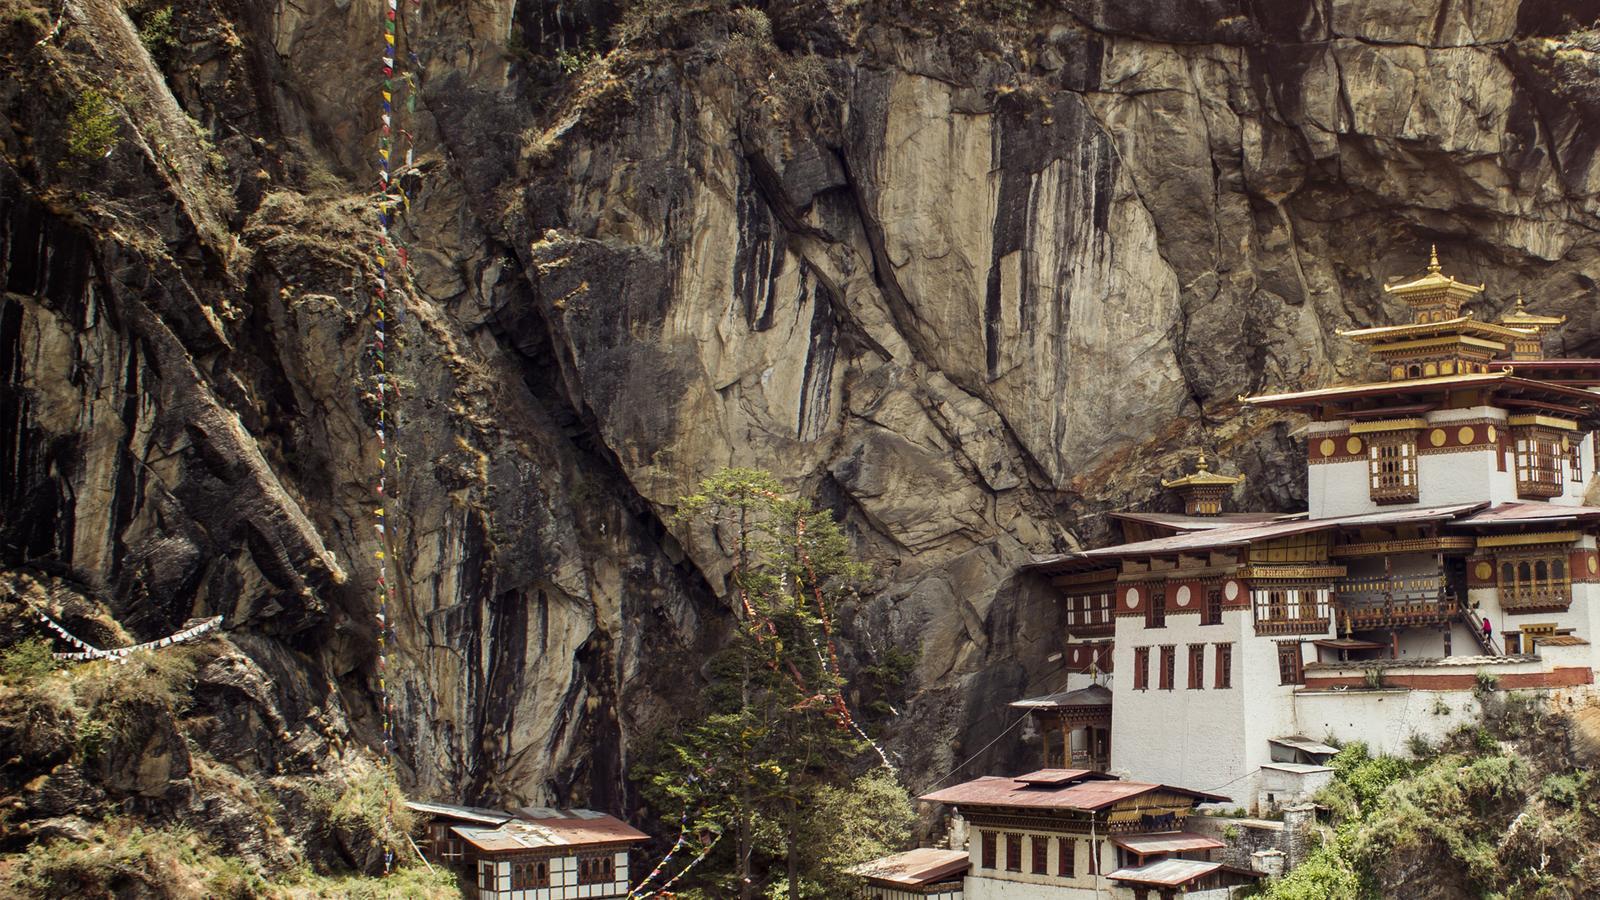 Taktshang-Kloster Tigernest Bhutan Kulturreise national geographic traveljunkies